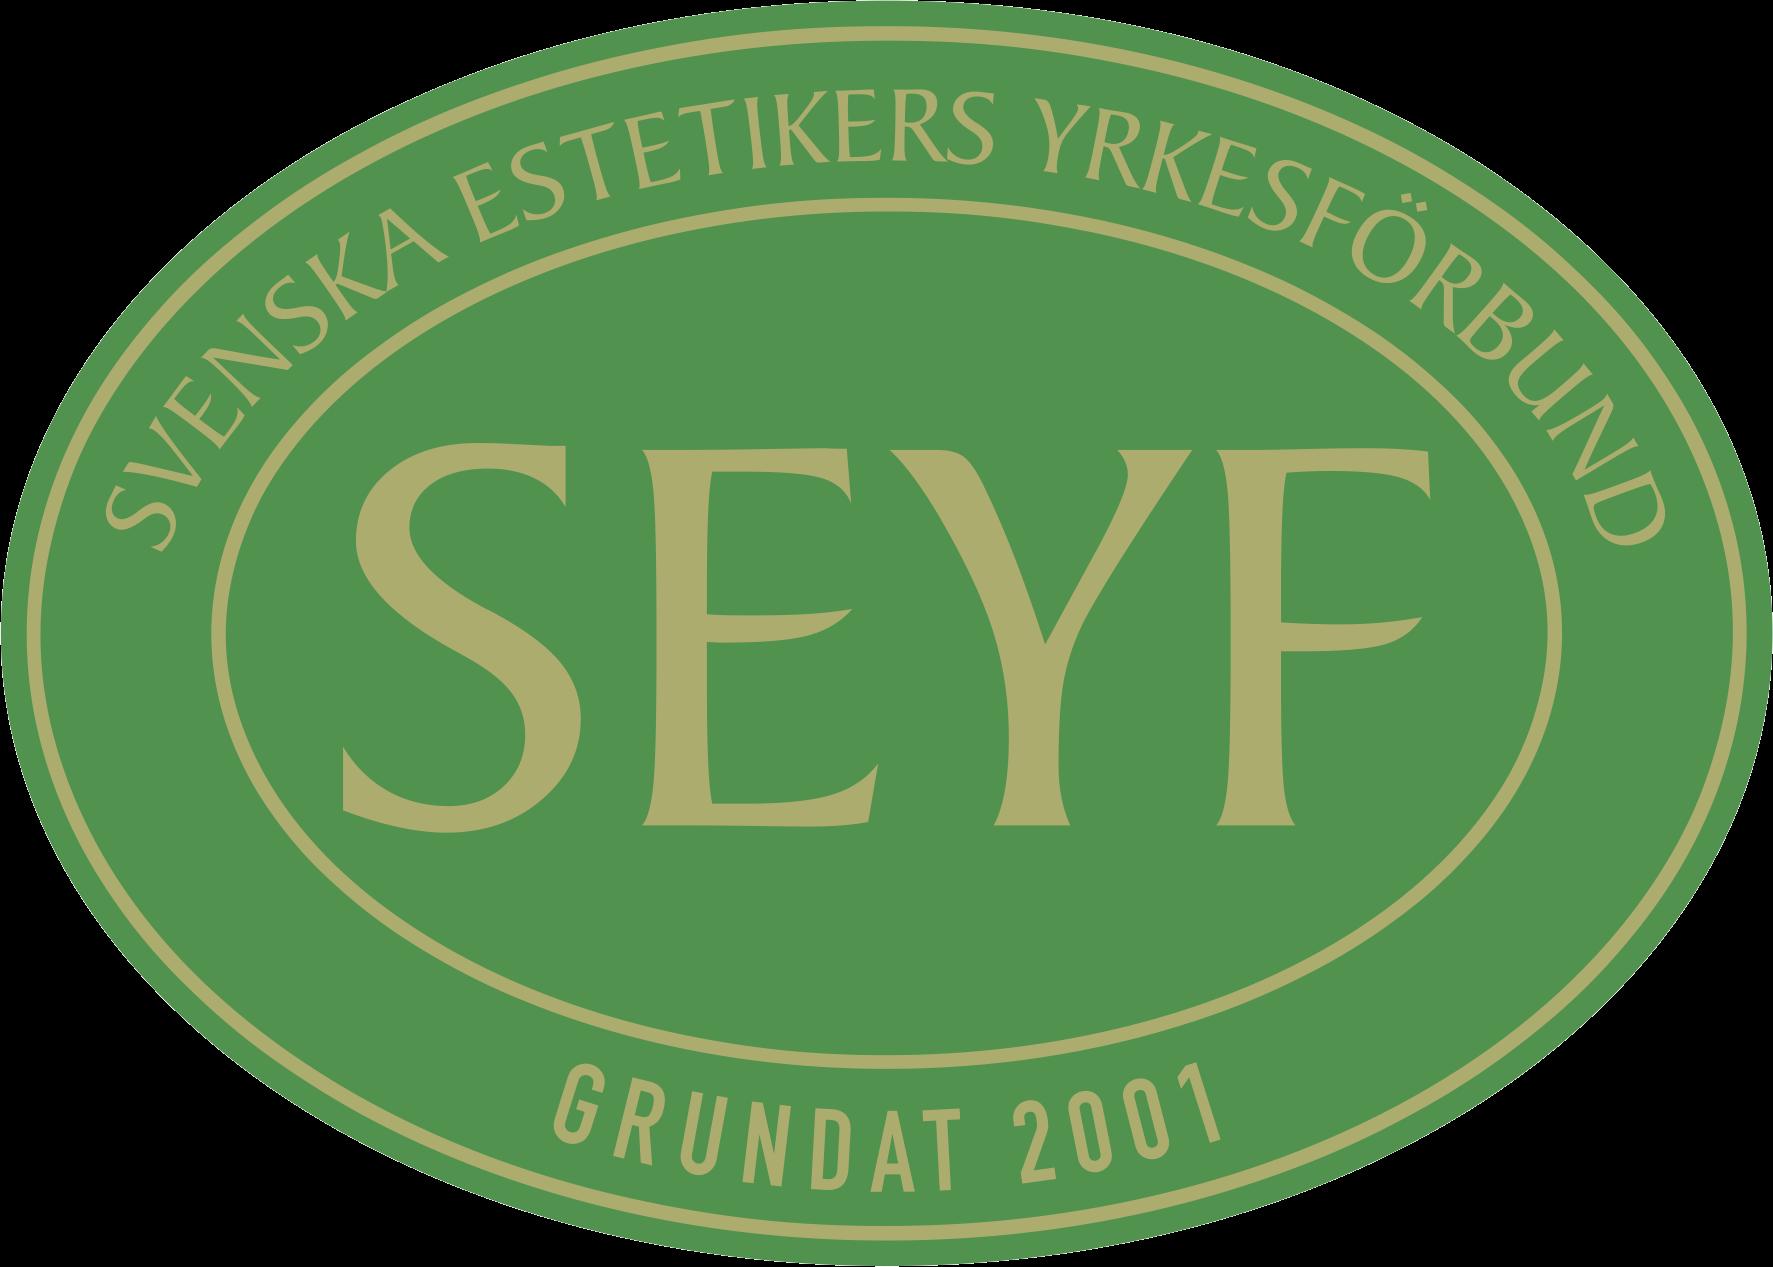 SEYF Logotyp